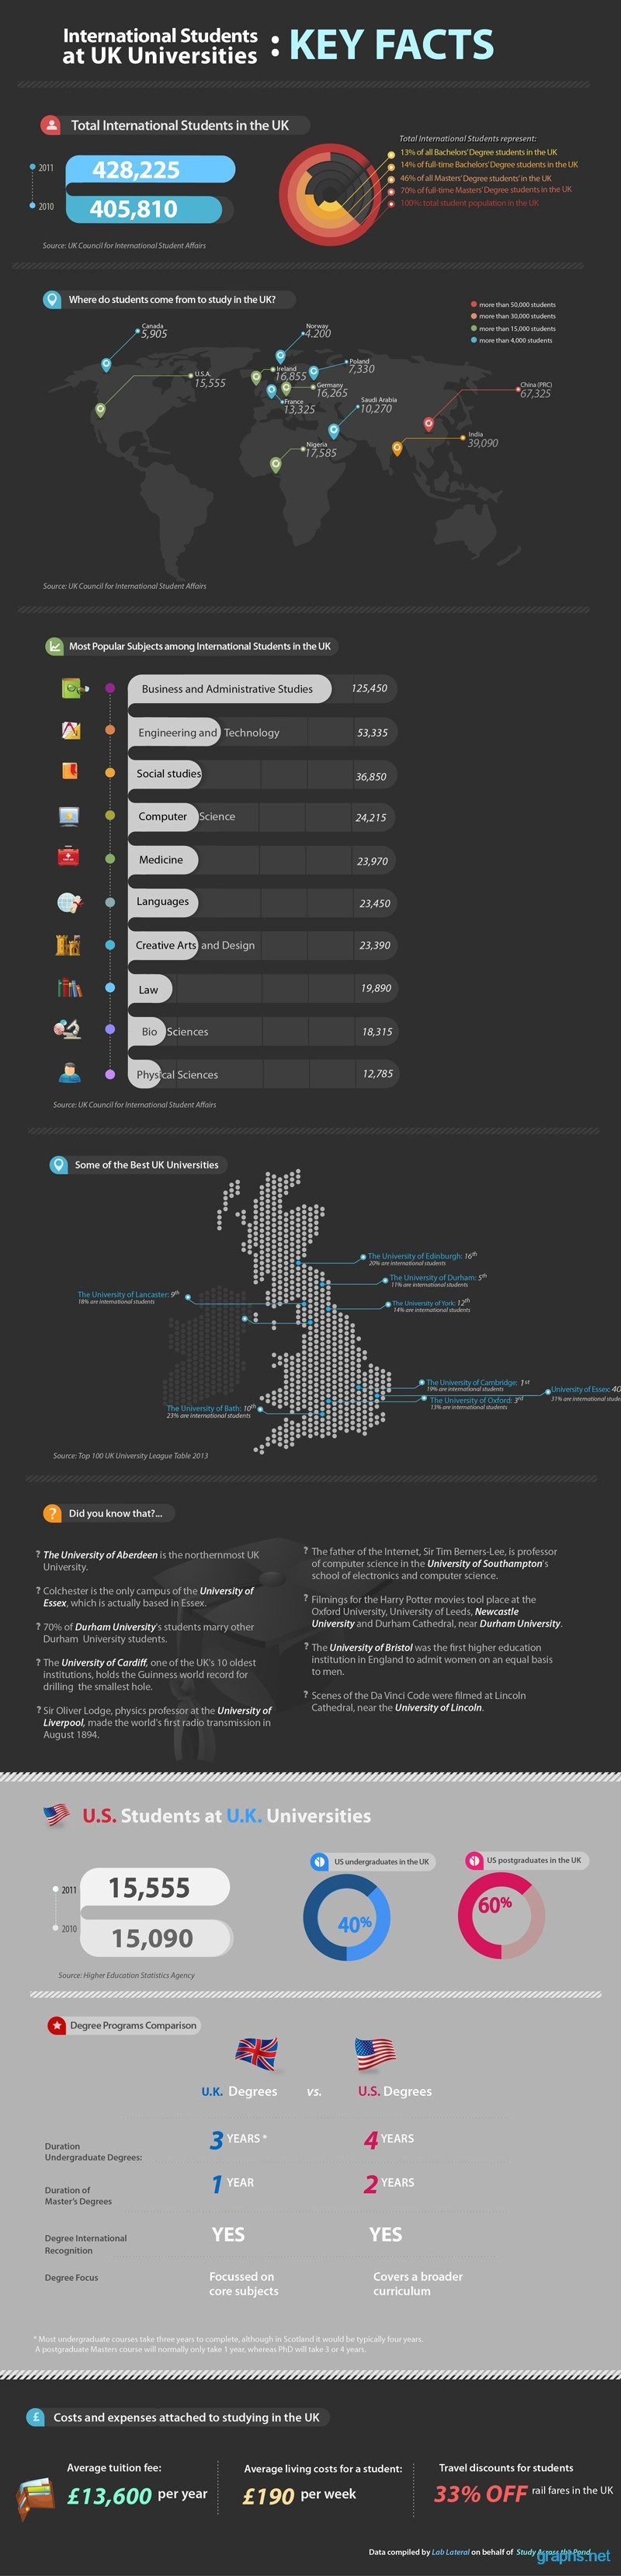 Percentage of International Students at UK Universities